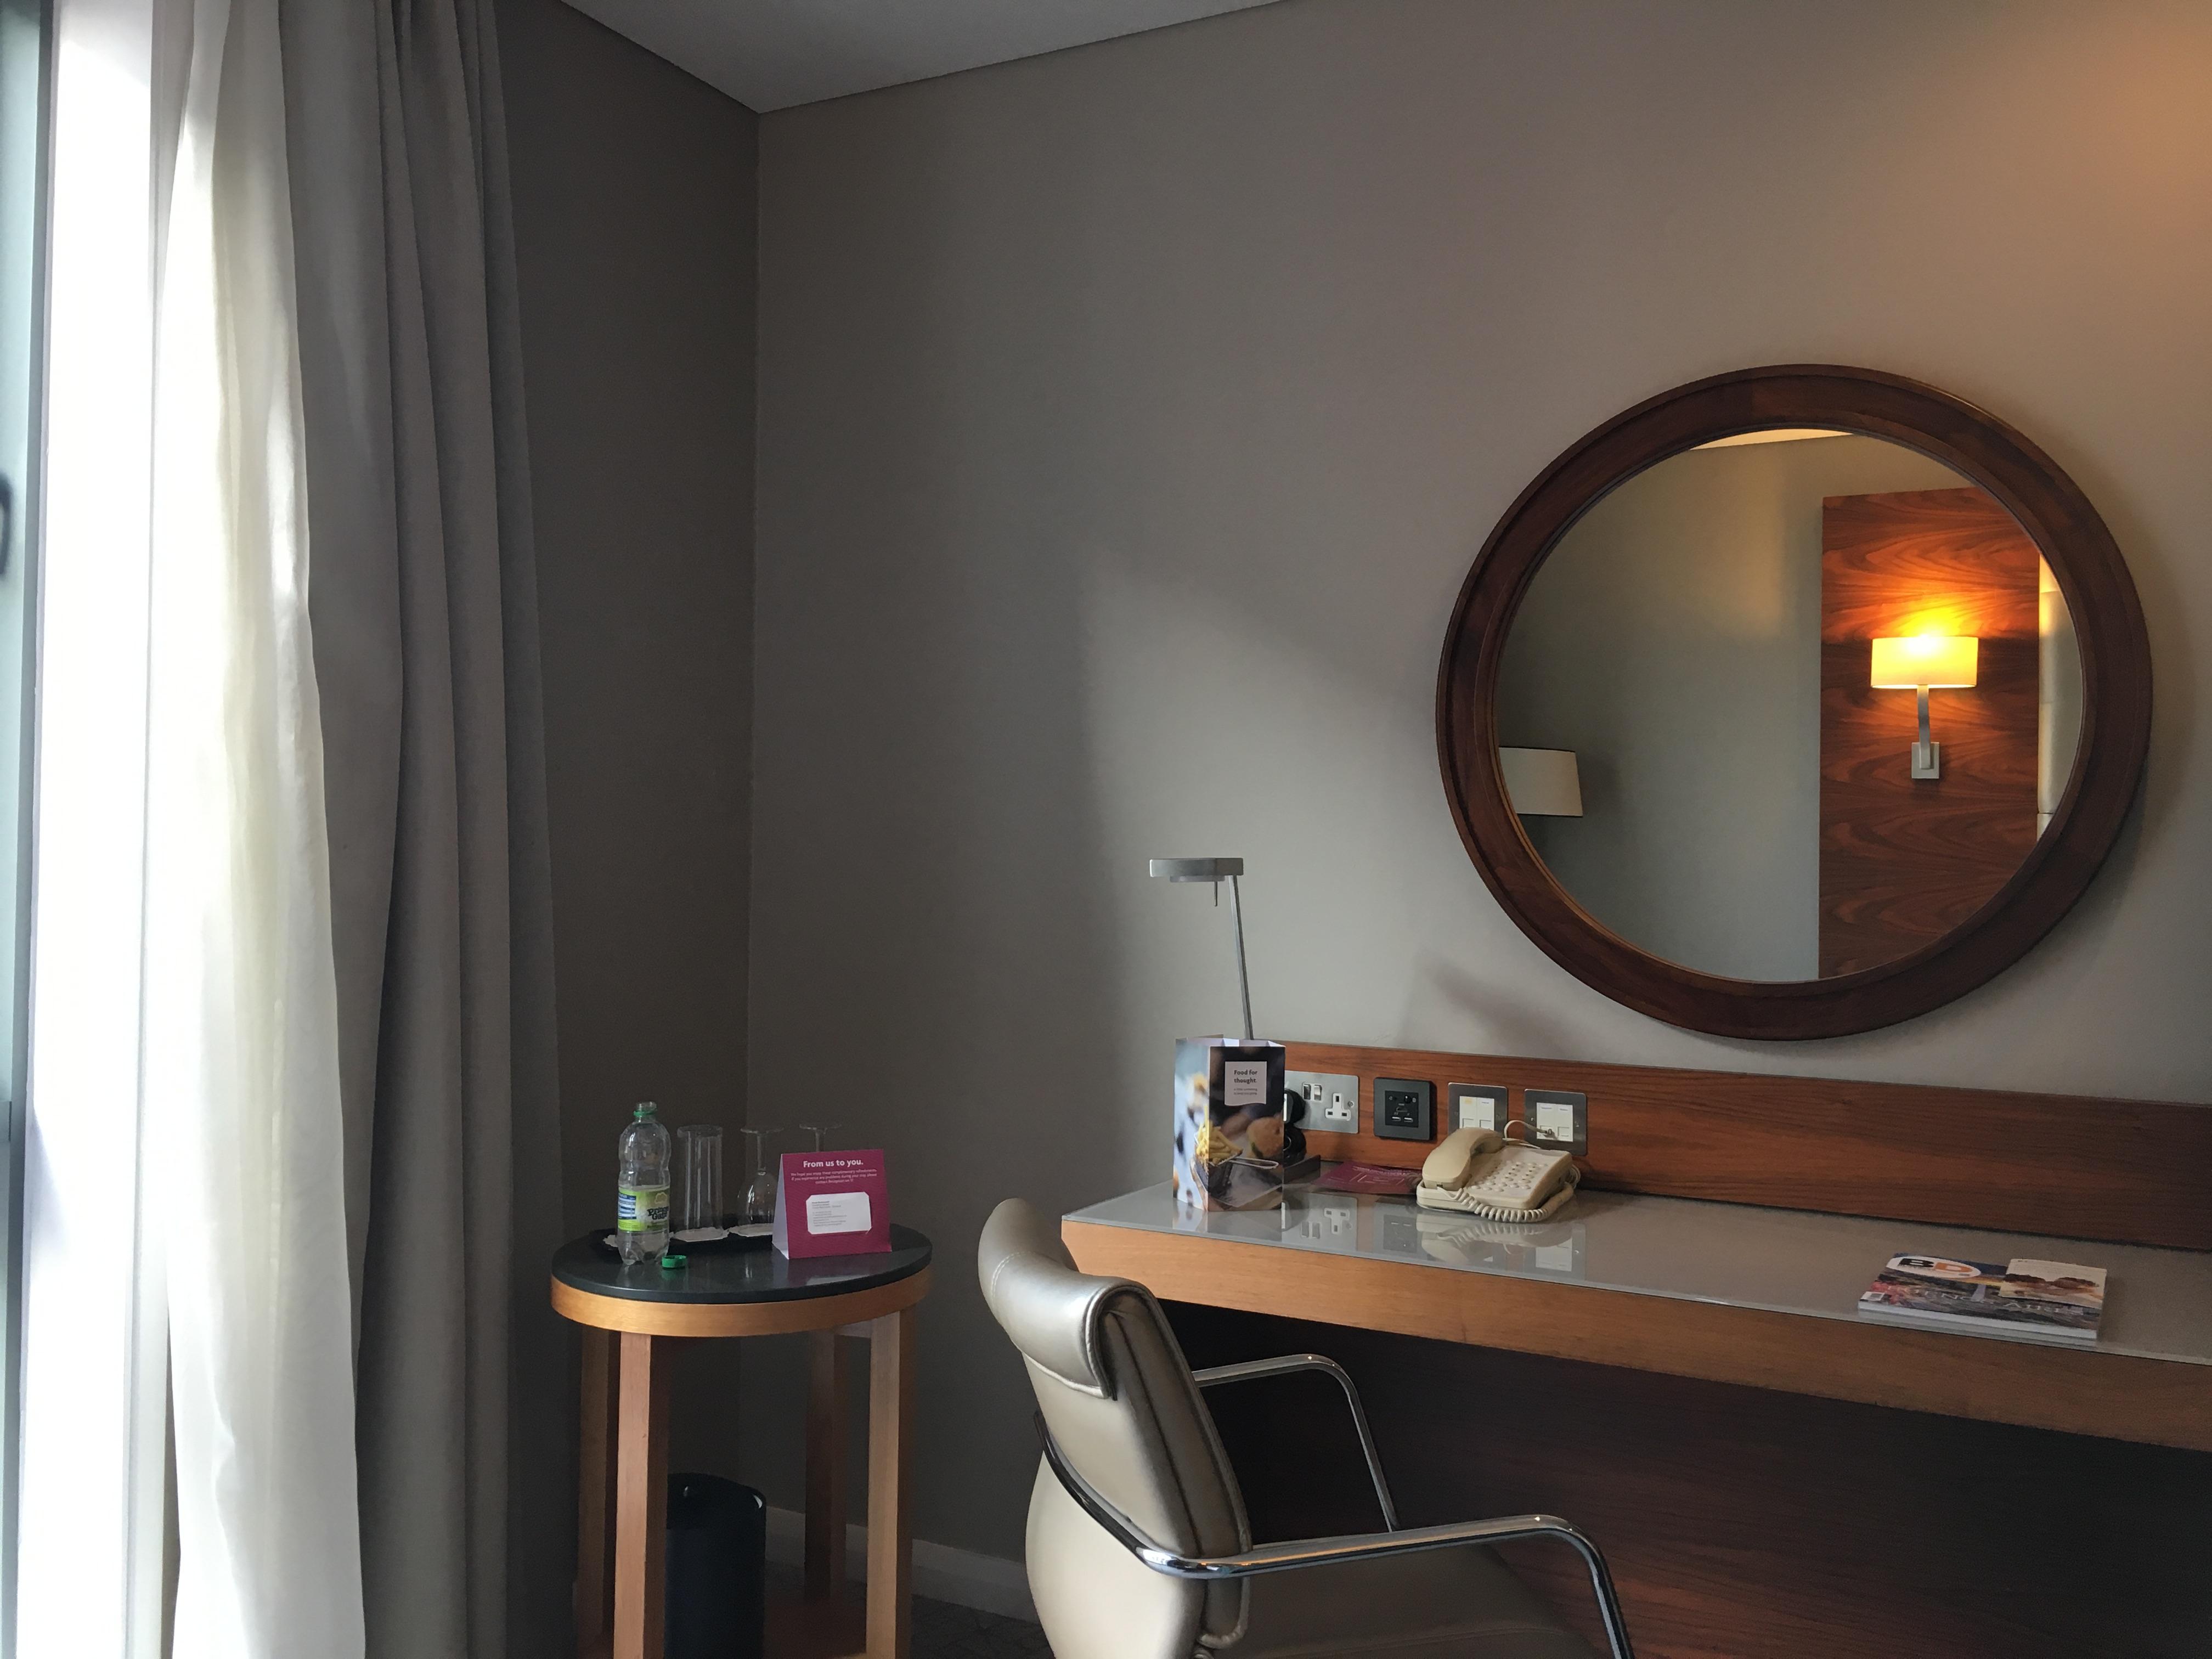 Hotel Review : クラウンプラザ ロンドン ドックランズ(Crowne Plaza London Docklands)